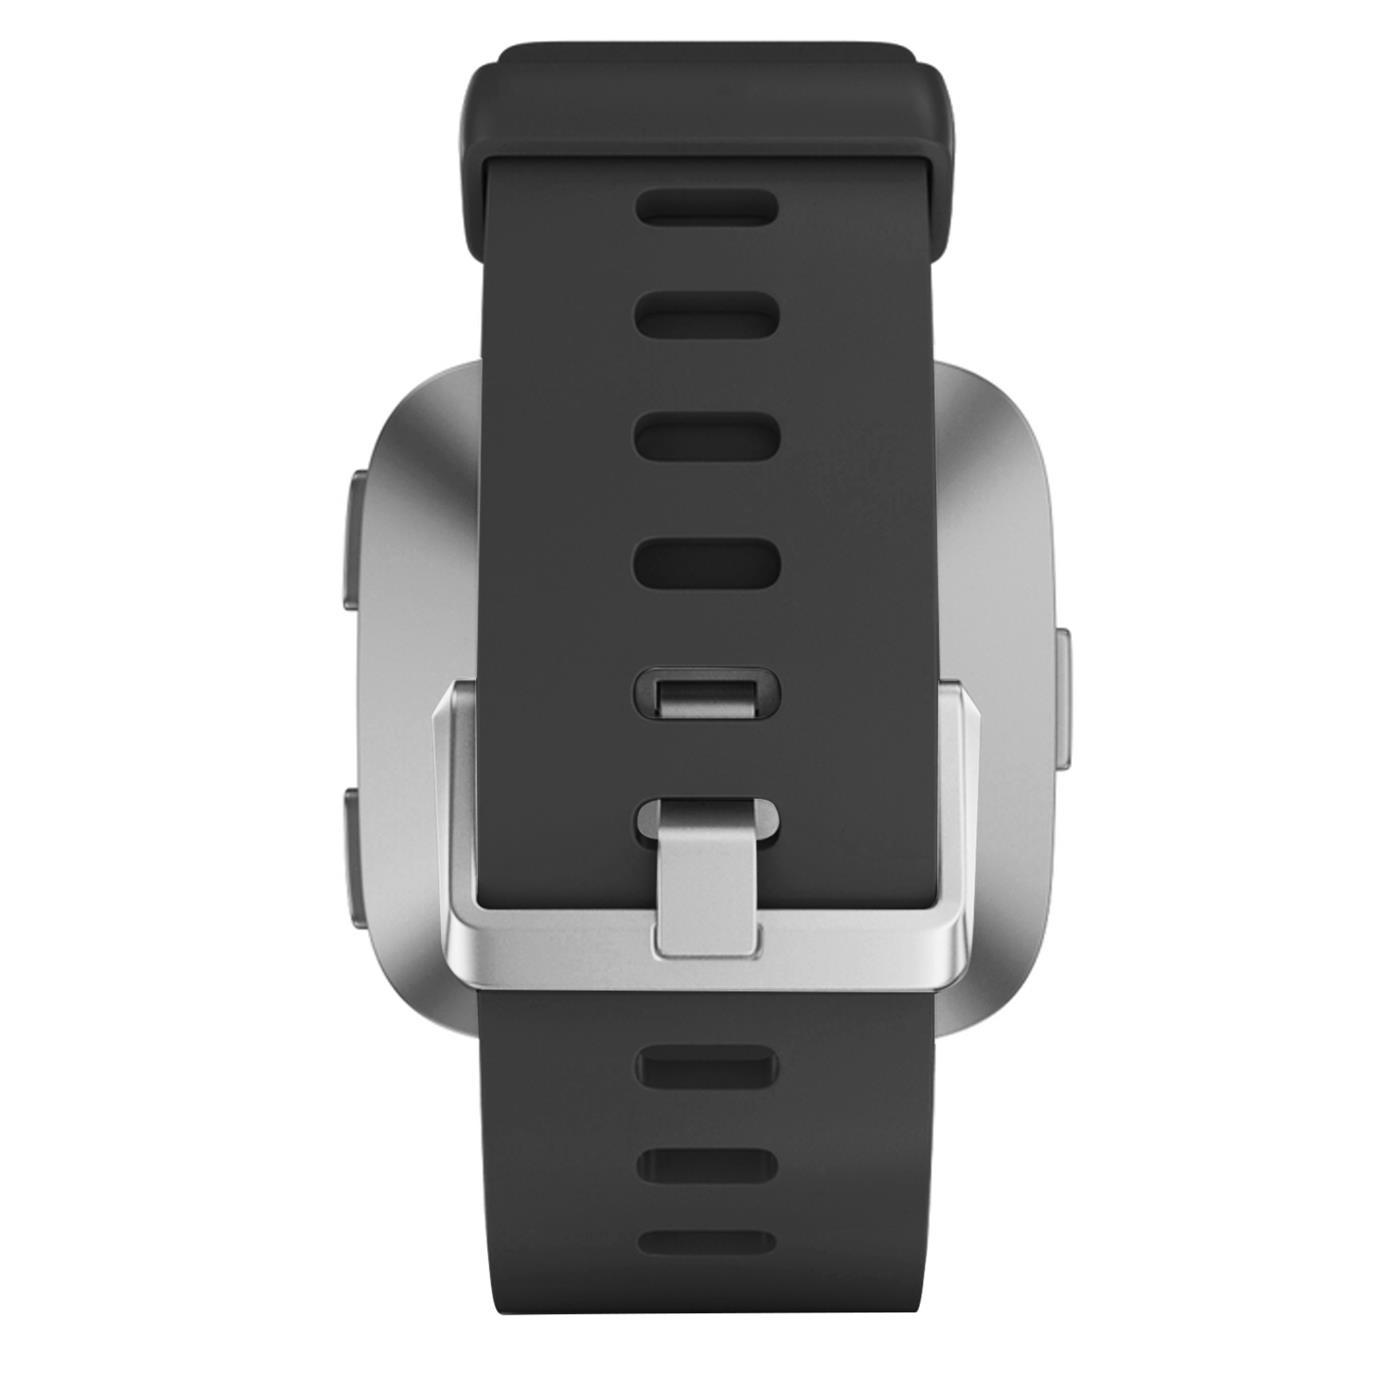 Fitbit-Groesse-S-oder-L-Ersatz-Silikon-Armband-Uhren-Sport-Band-Fitness-Tracker Indexbild 40